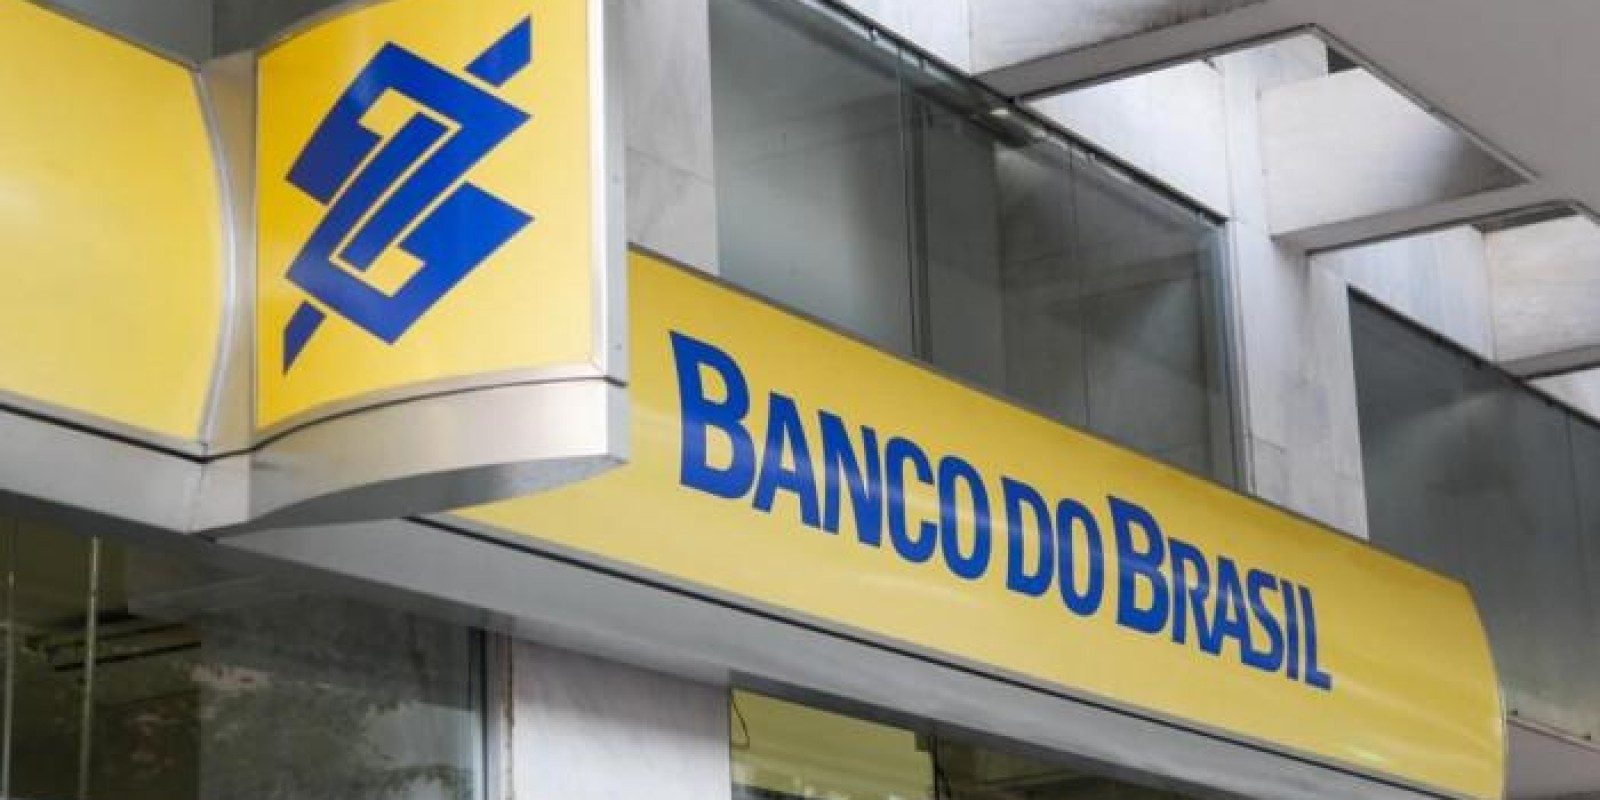 BB/Belo Campo é condenado a pagar R$100 mil por assédio moral